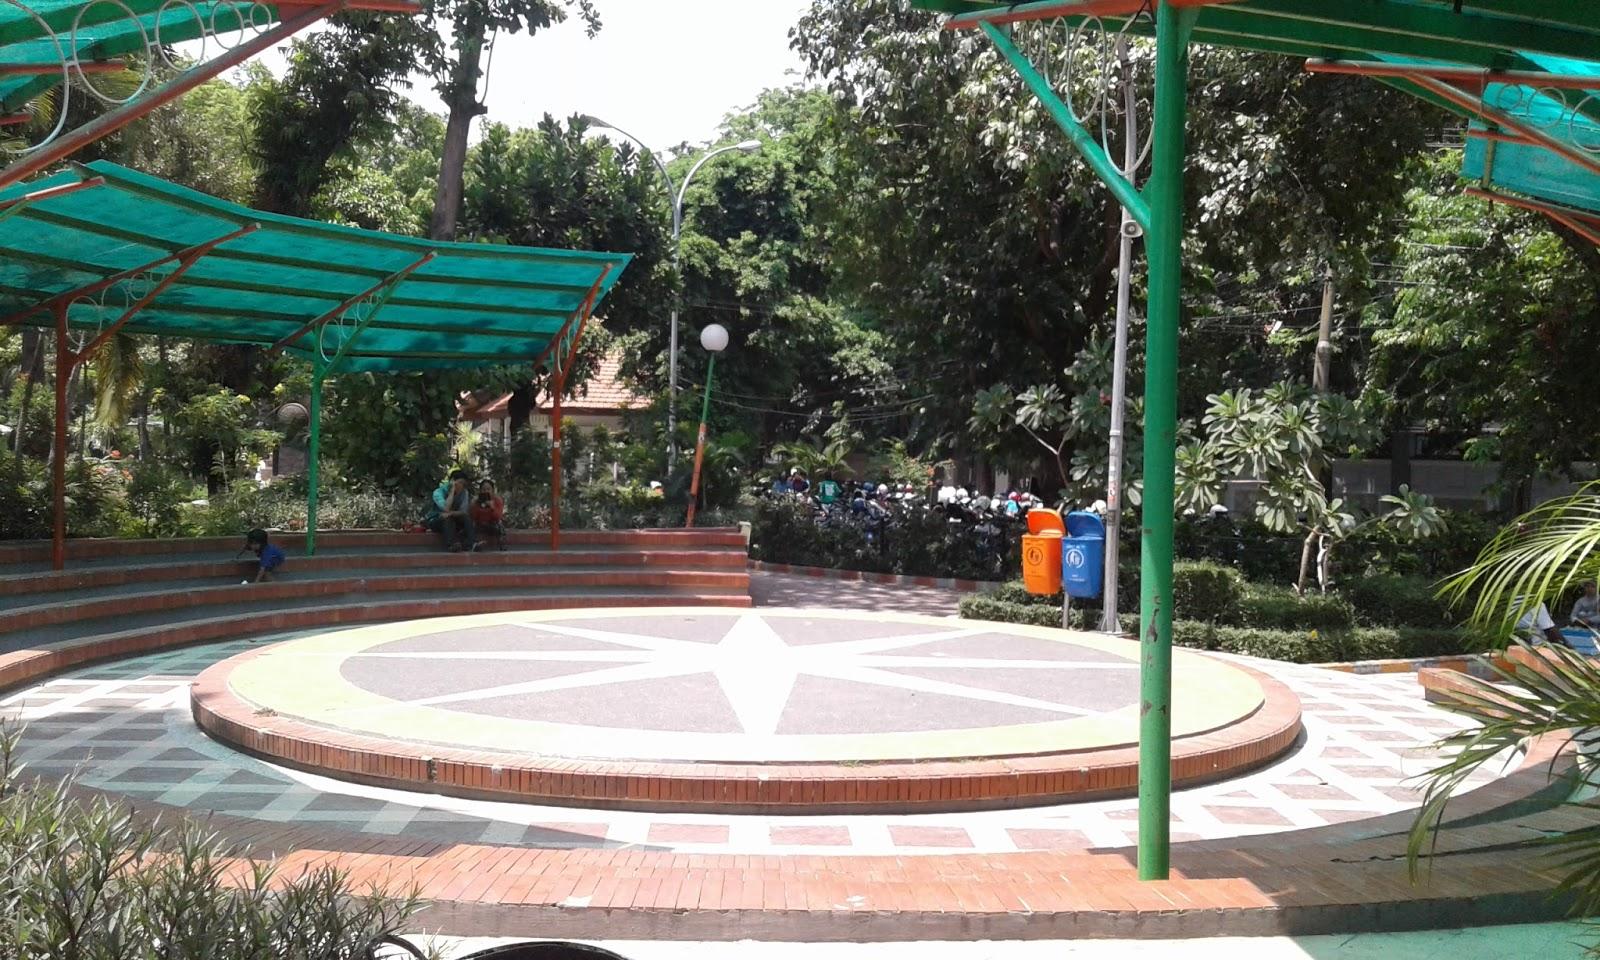 Hmmm Cantiknya Taman Prestasi Surabaya Catatan Harian Qc Inspector Salah